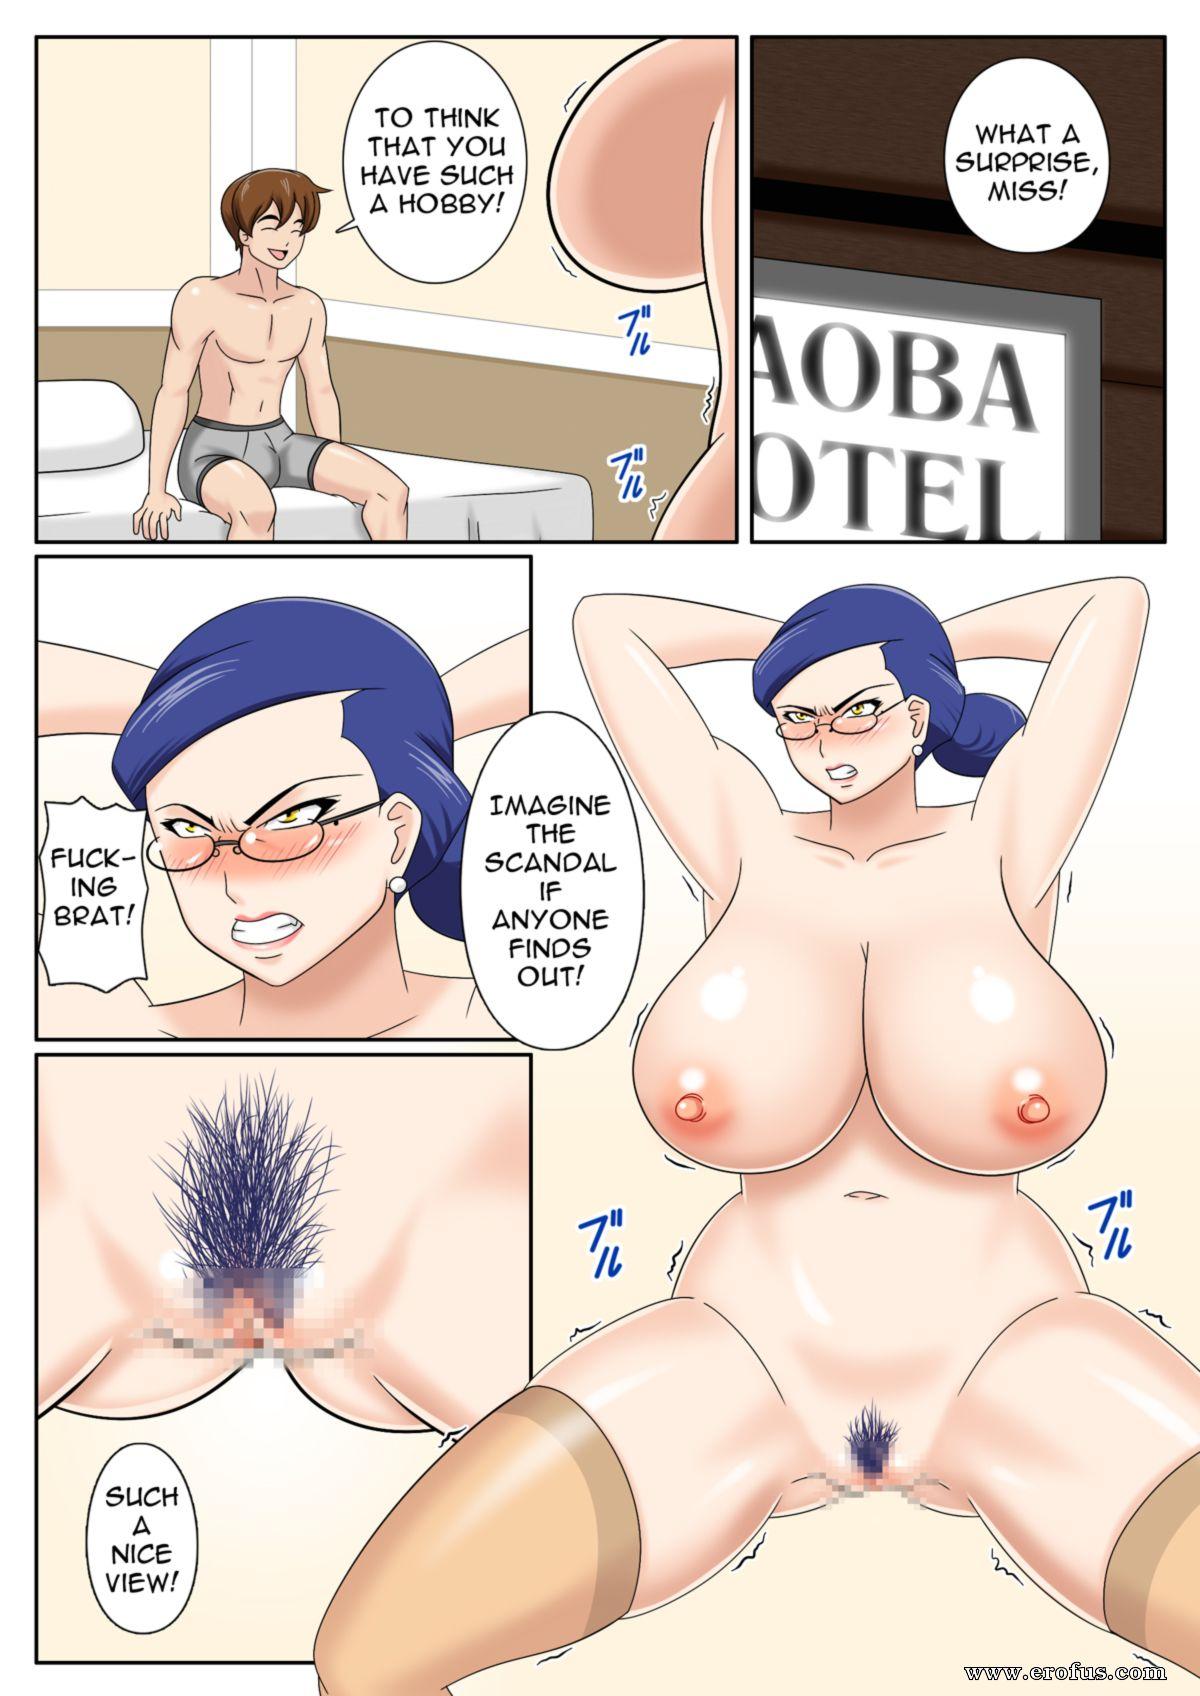 Hentai brat sex